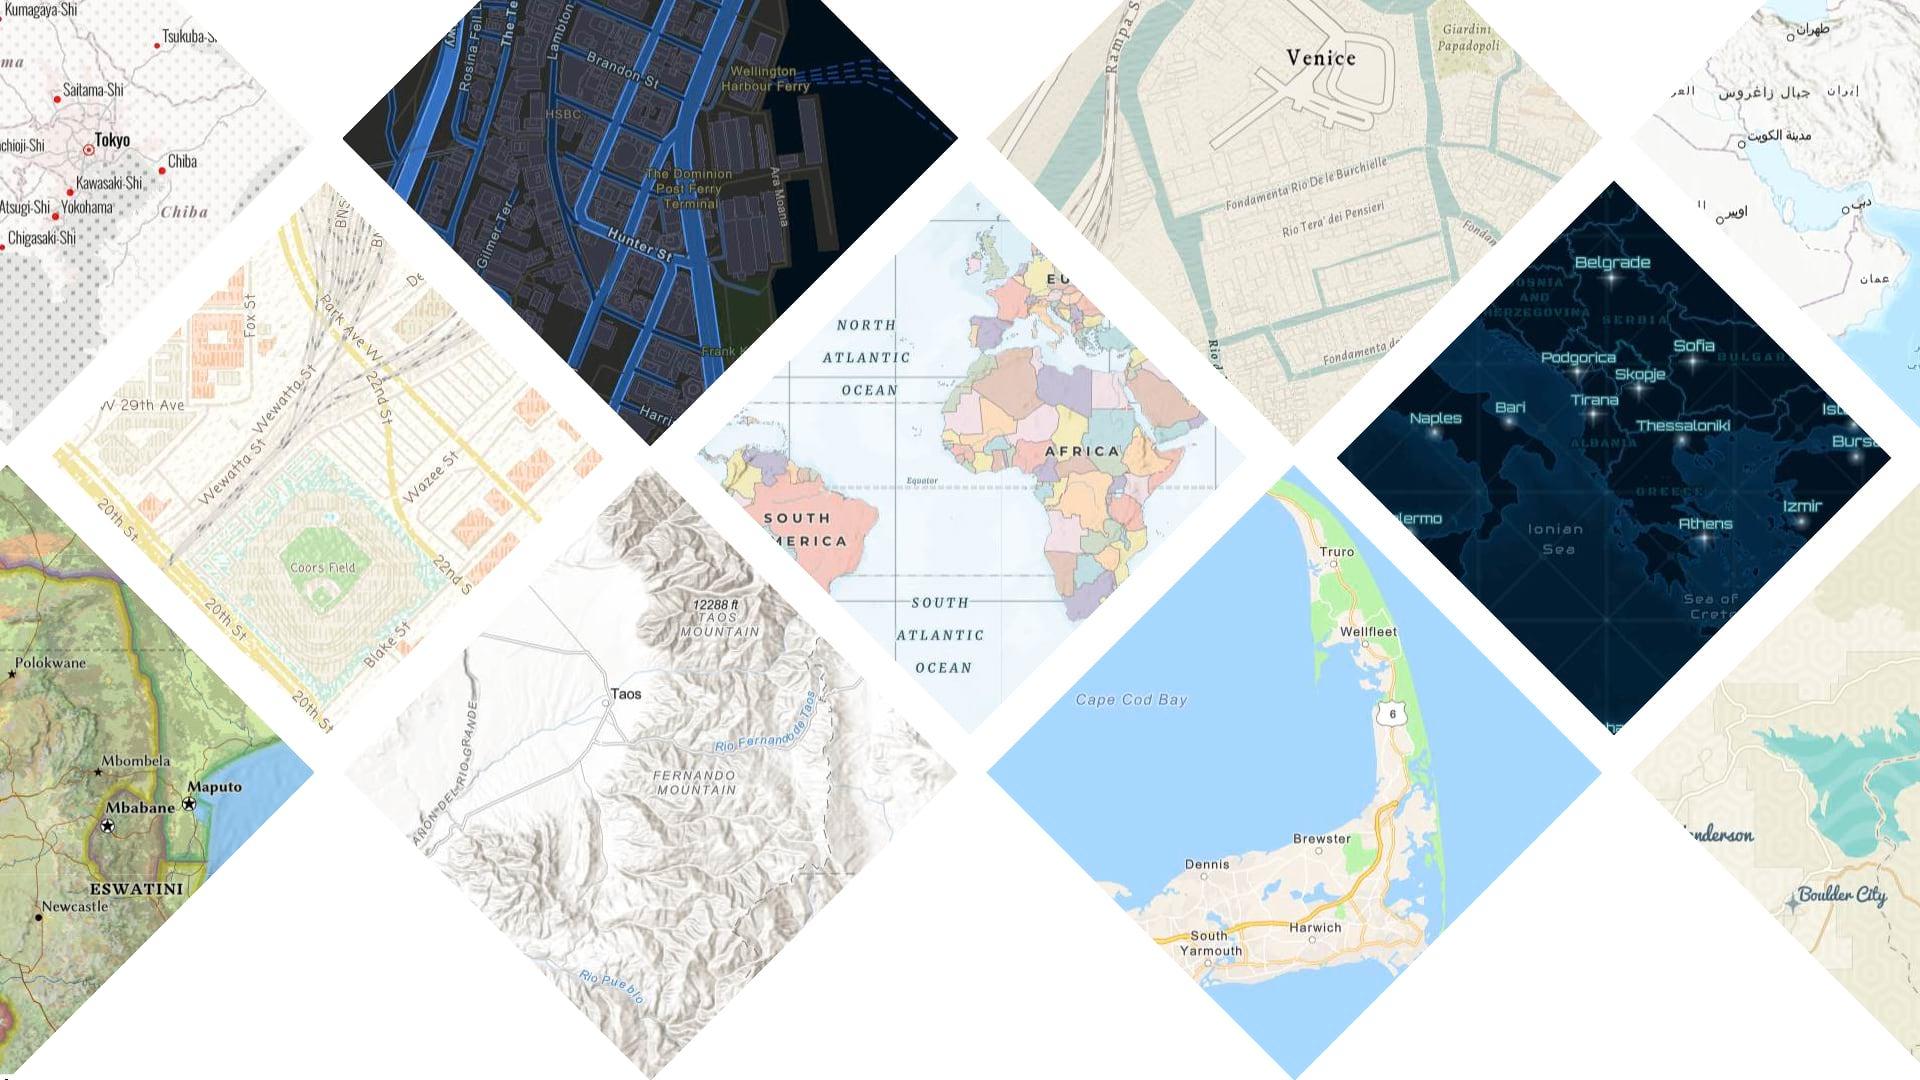 Whats new in Esri Vector Basemaps